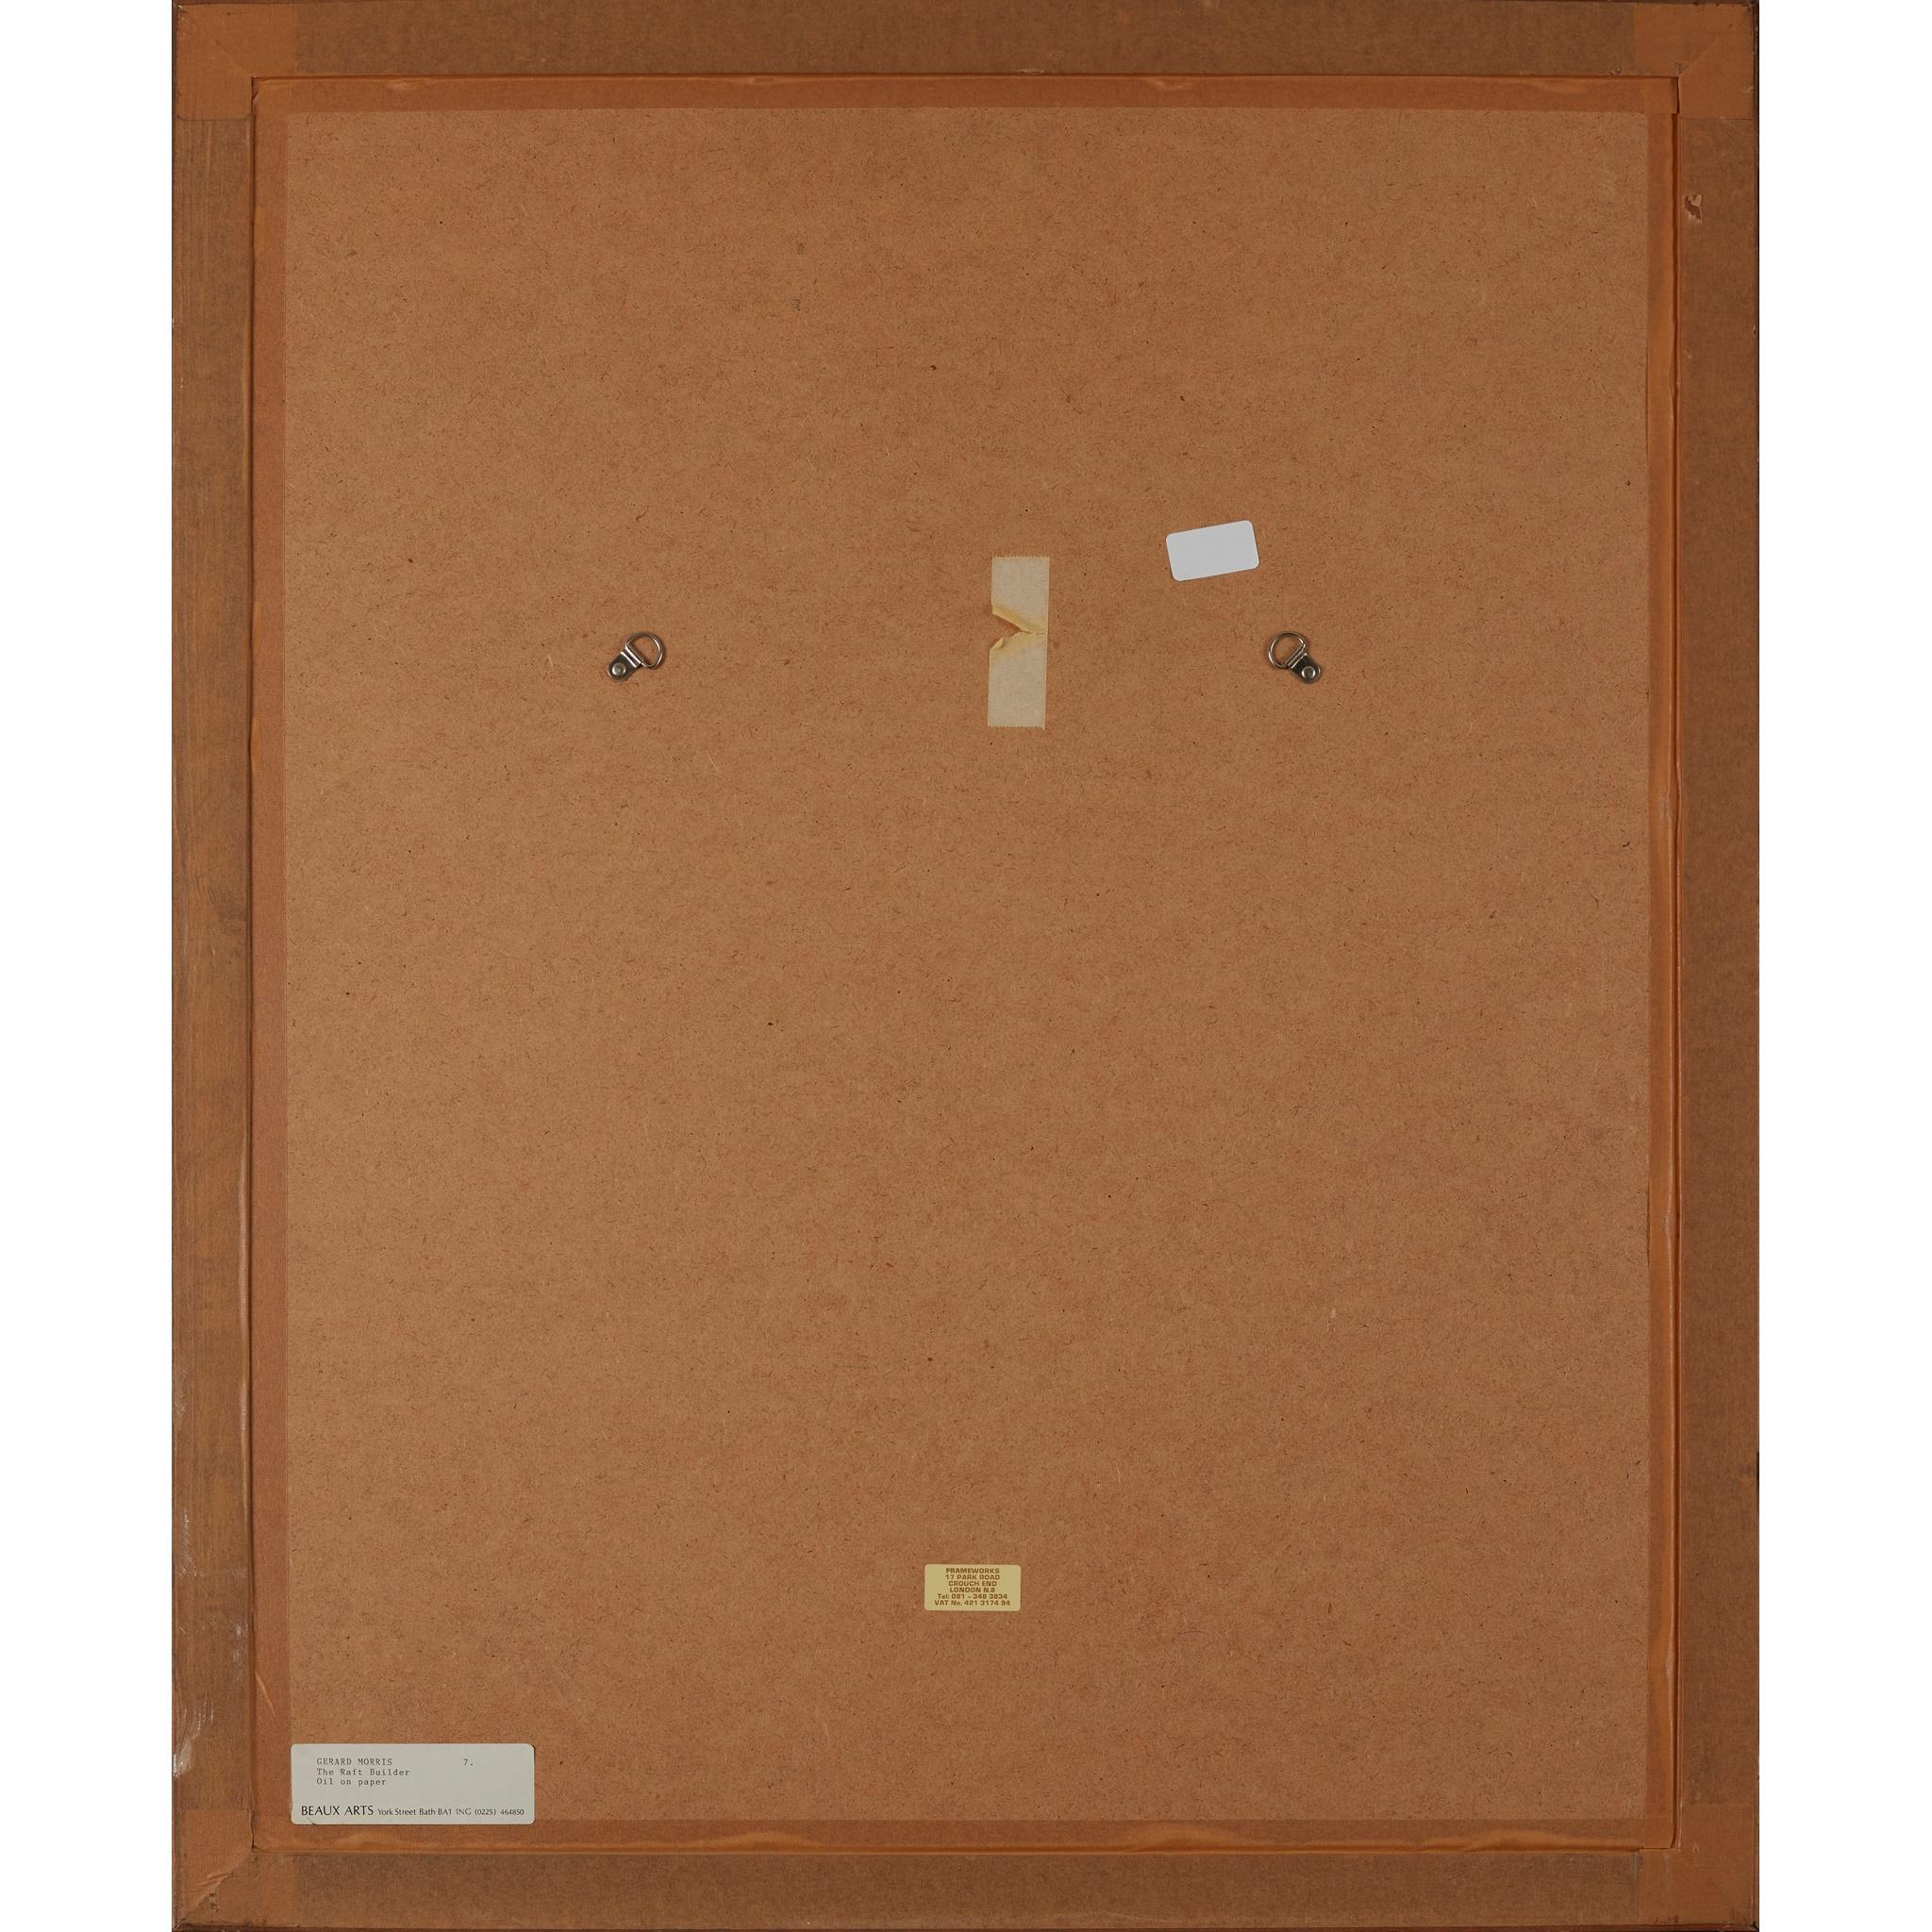 § GERARD MORRIS (SCOTTISH 1955-) THE RAFT BUILDER, 1991 - Image 3 of 3